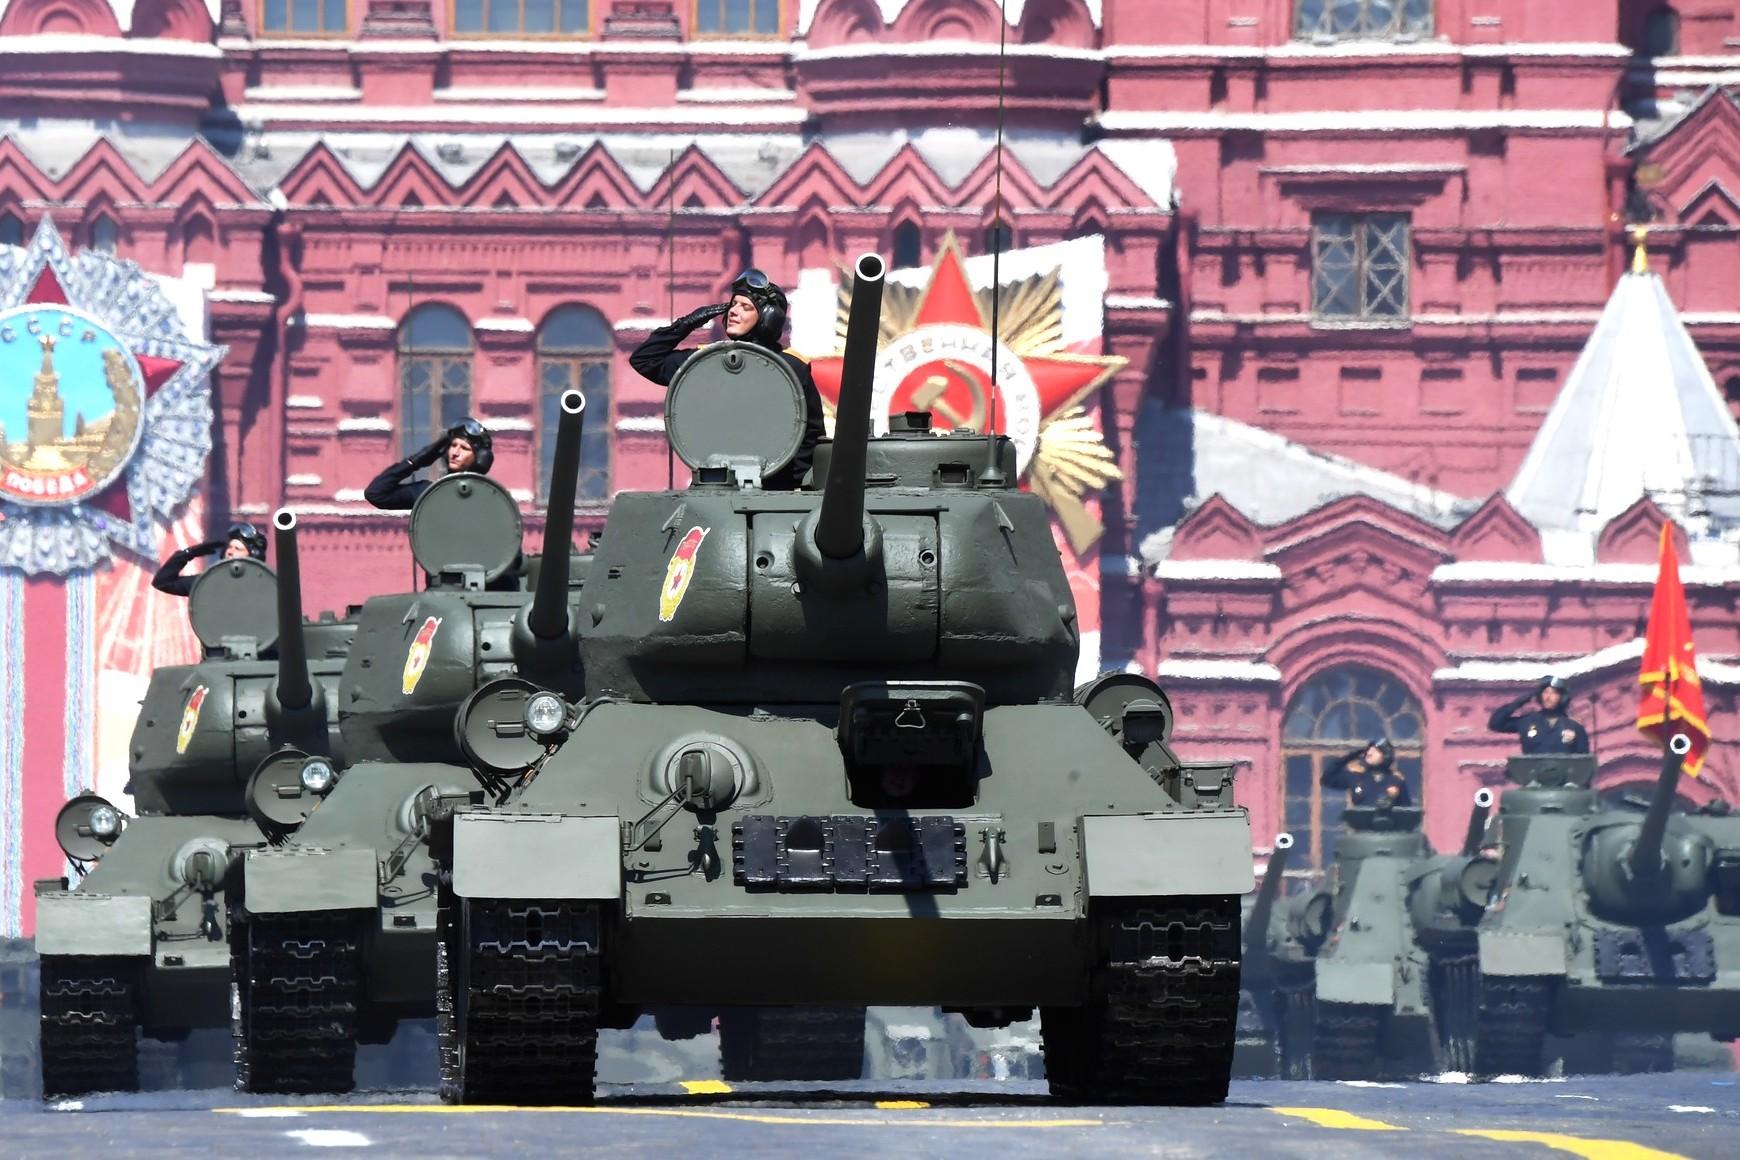 Tenkovi ruske armije tokom vojne parade povodom Dana pobede, Moskva, 24. jun 2020. (Foto: kremlin.ru)